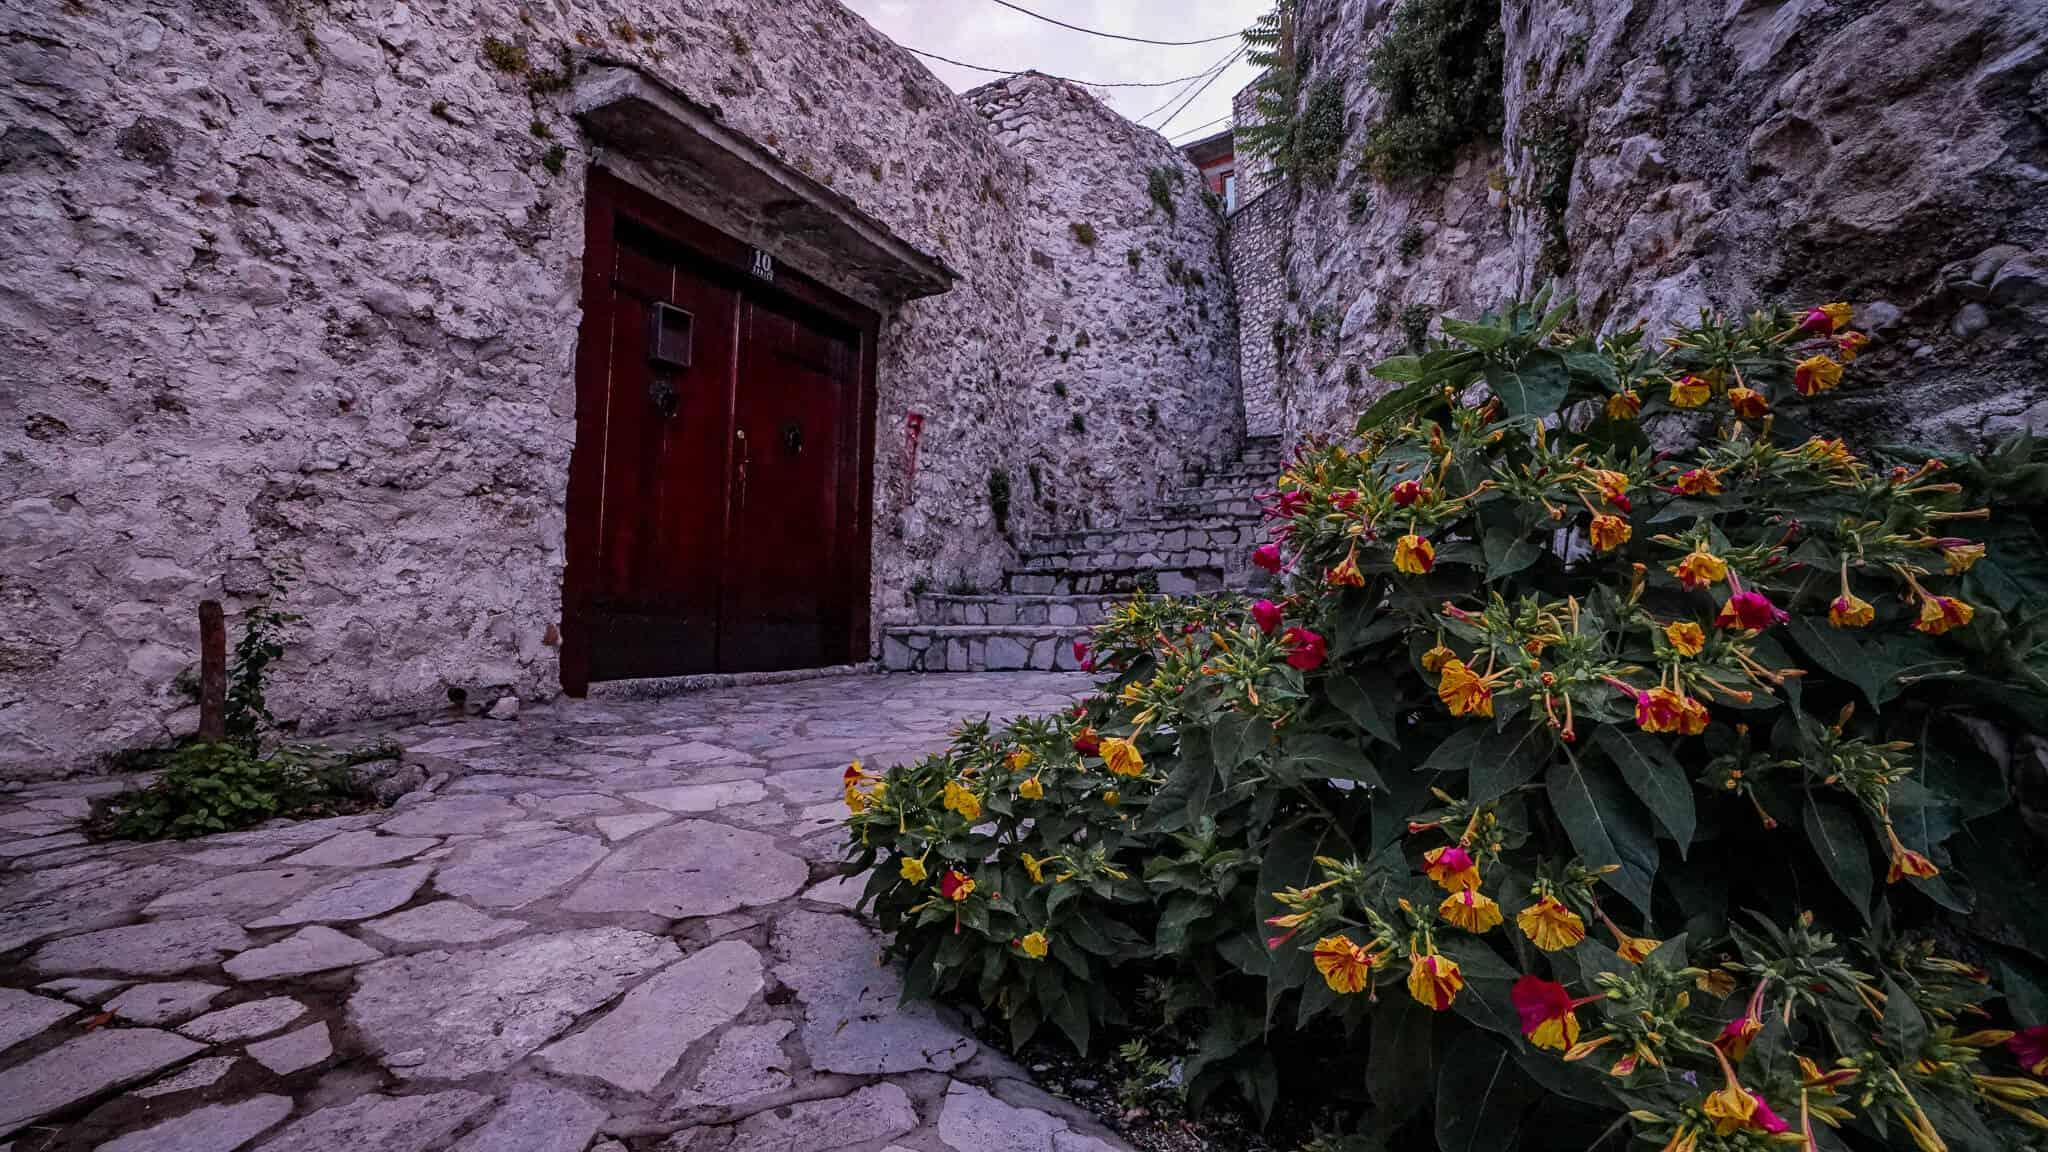 Gasse in Mostar